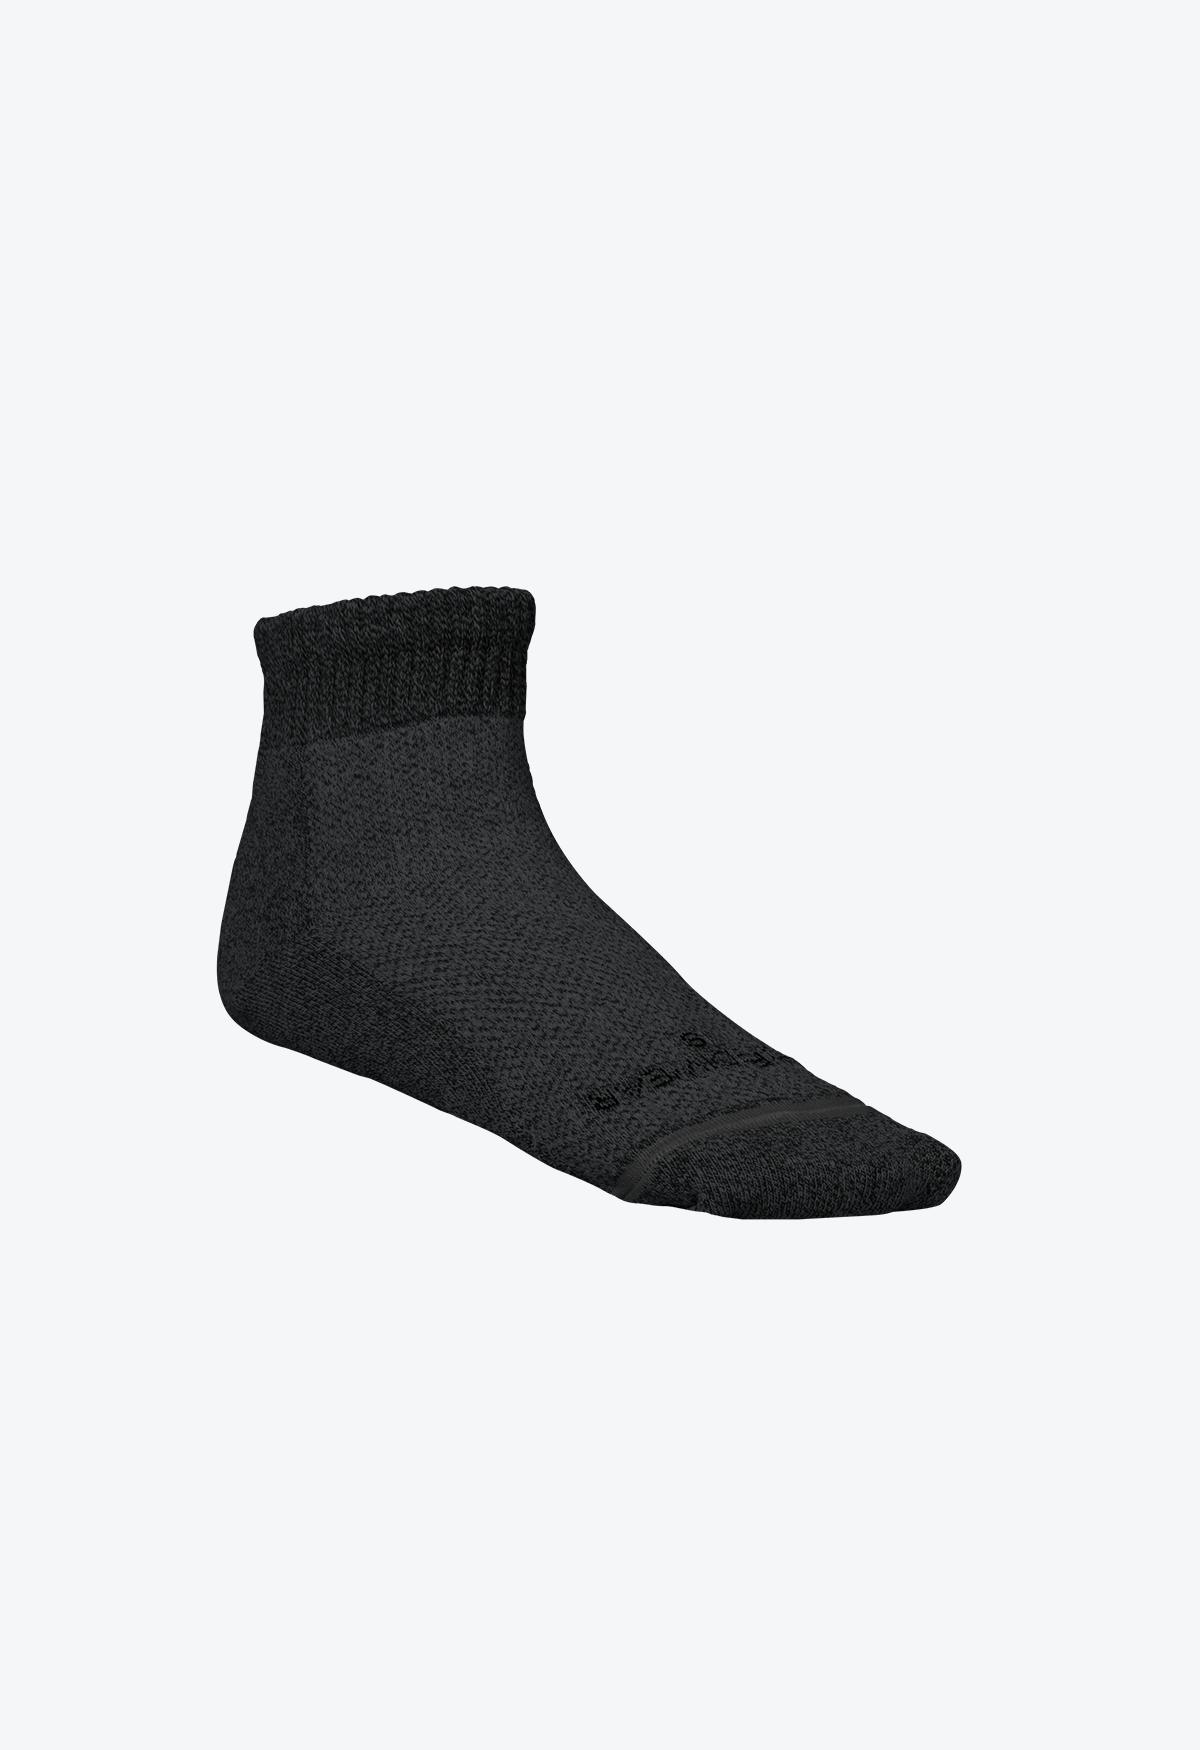 Circulation_Socks_Black_Ankle_Left